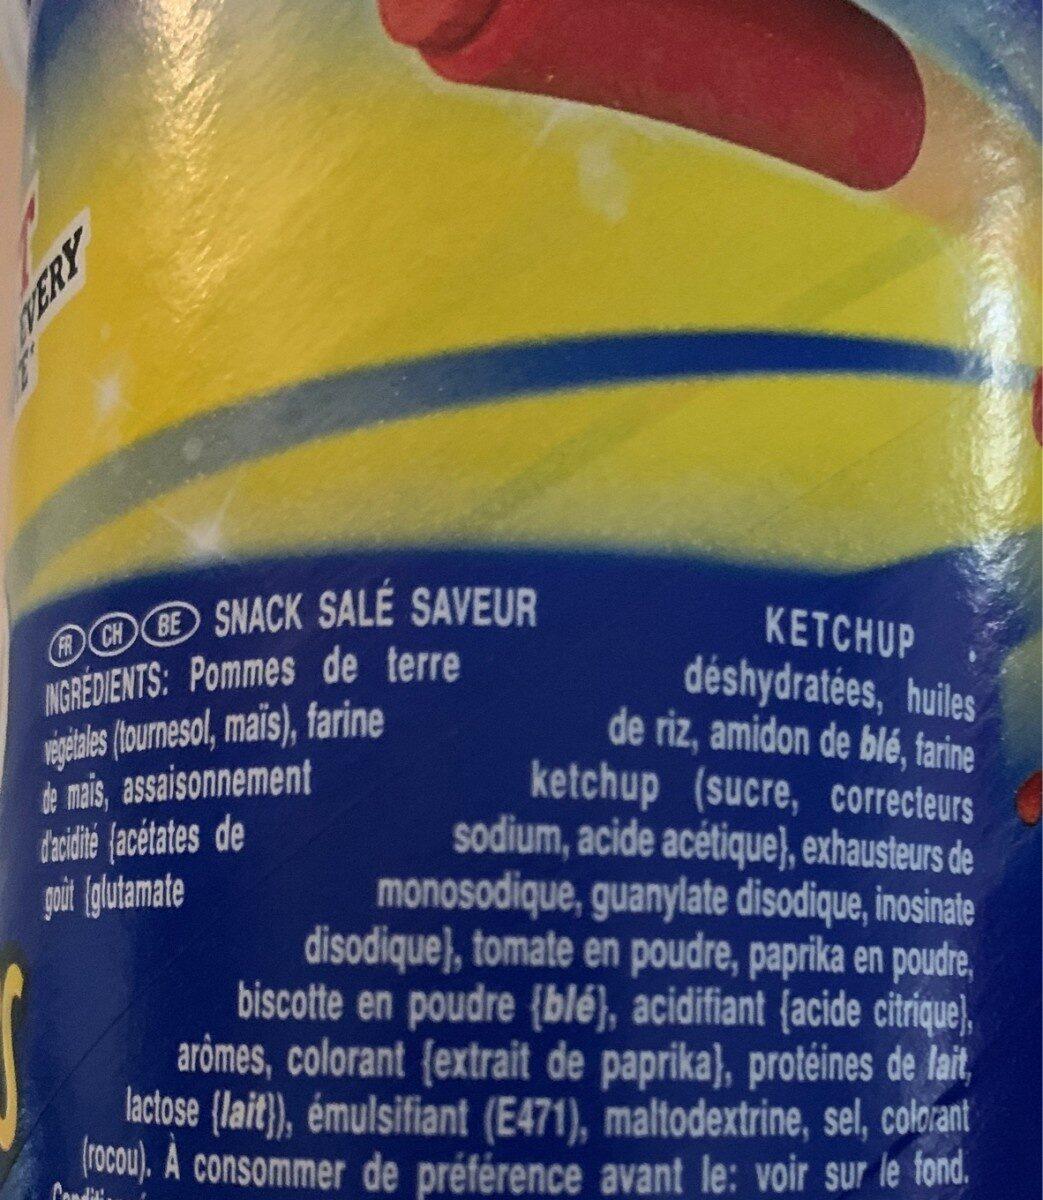 Pringles ketchup - Ingredientes